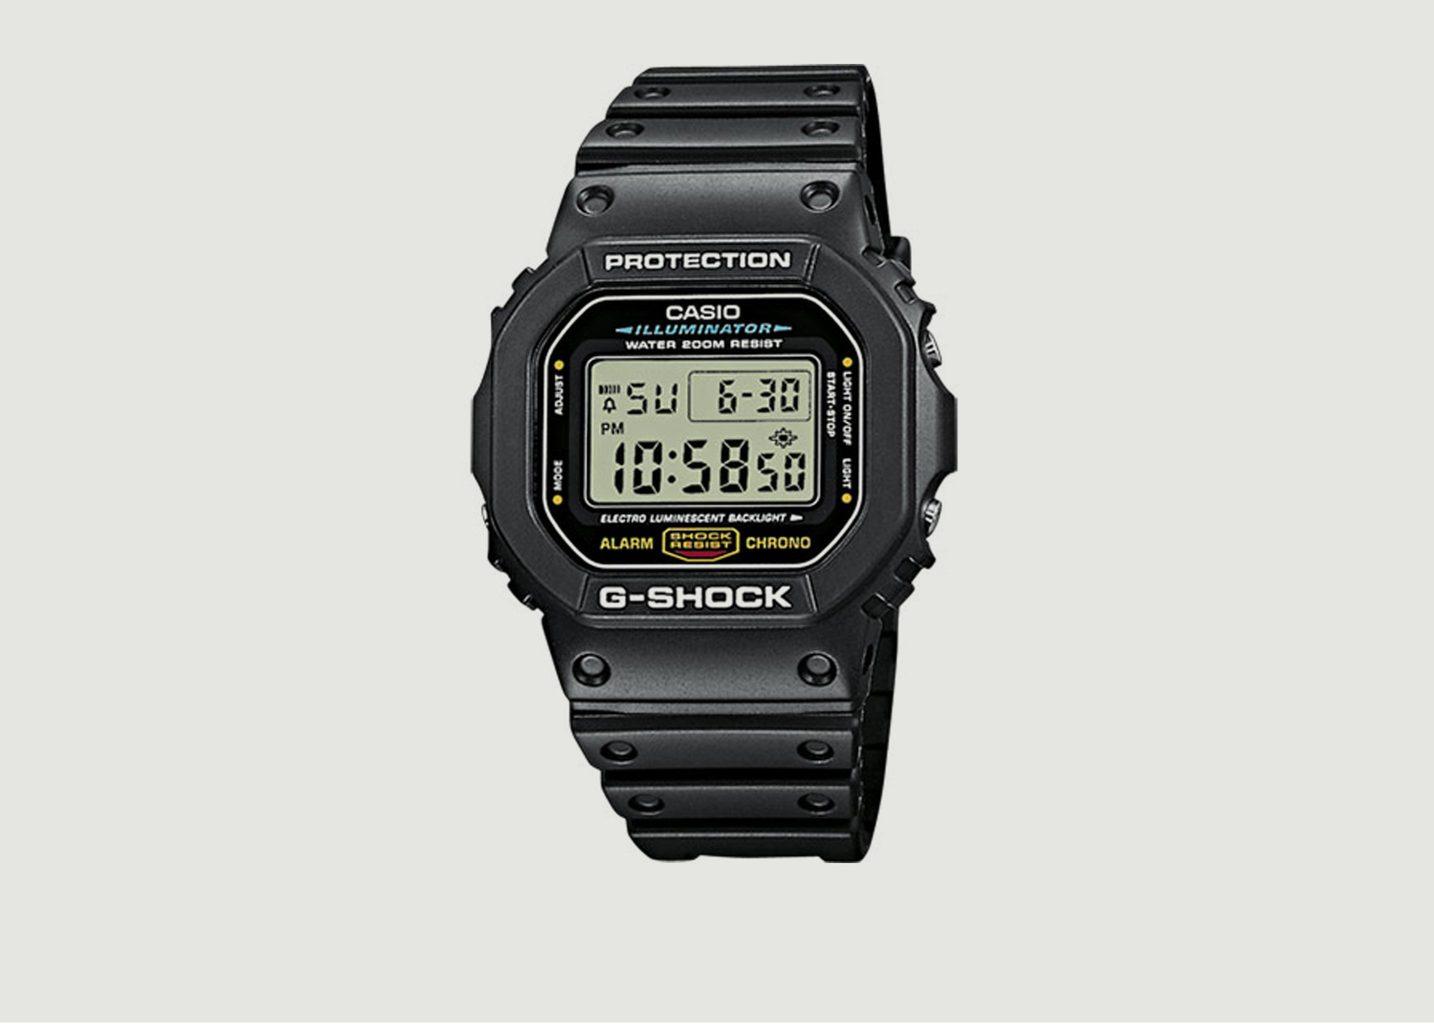 Montre G-SHOCK The Origin DW-5600E - Casio G-SHOCK